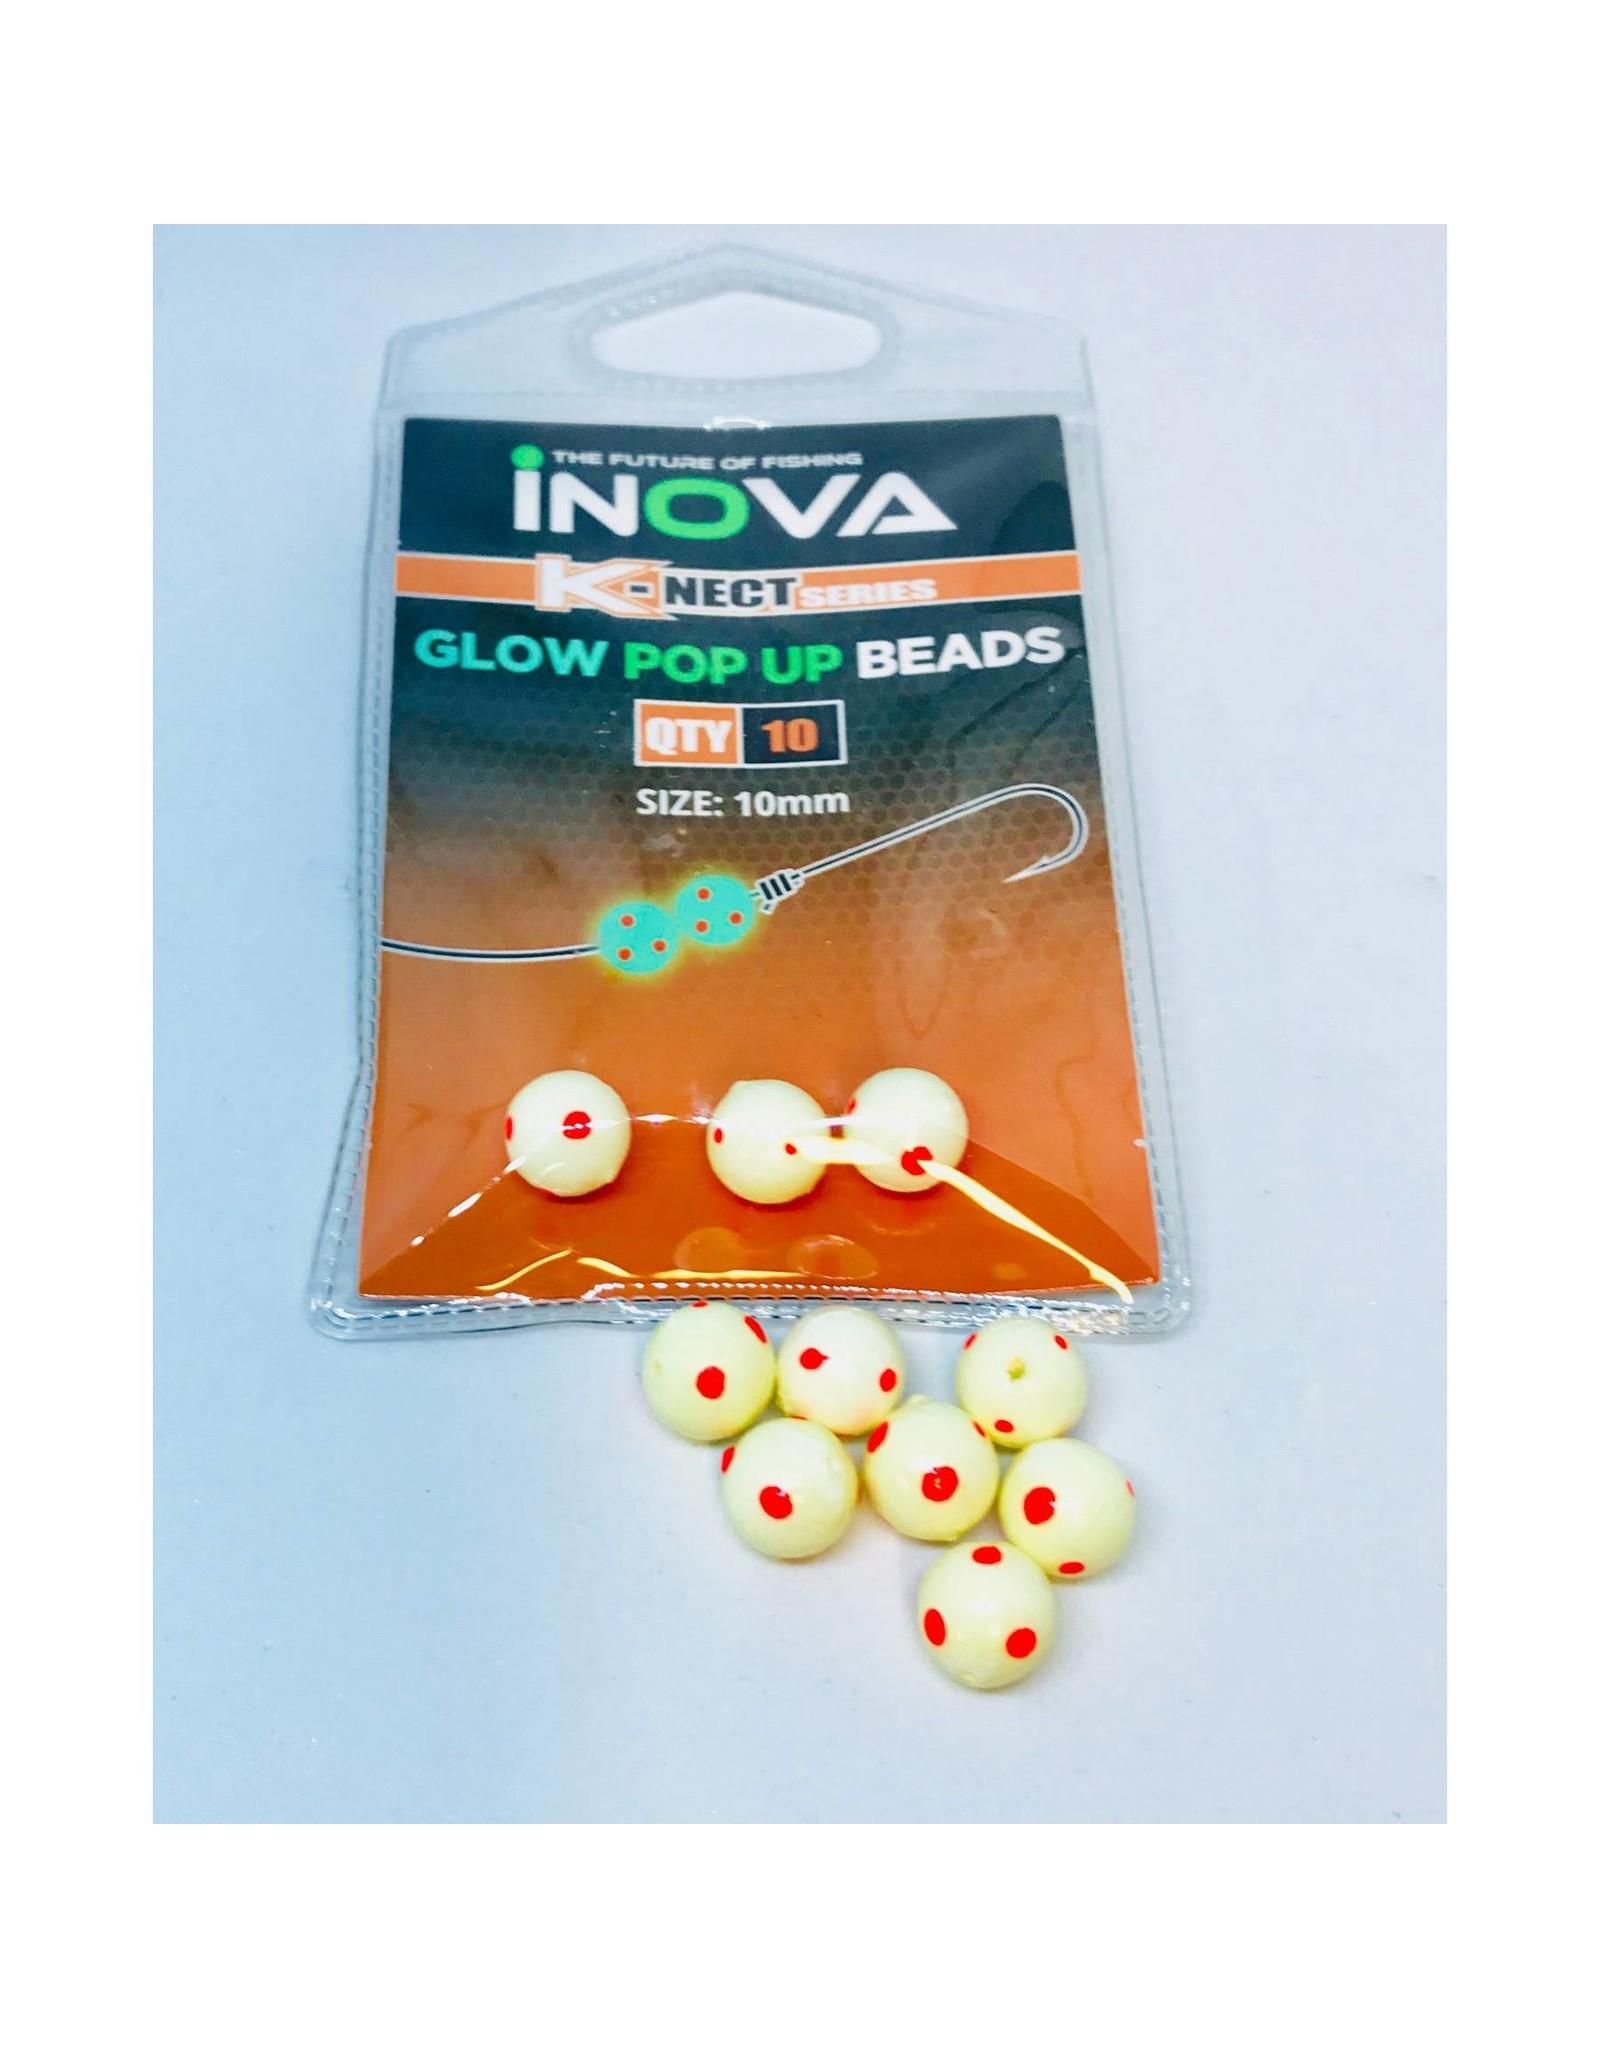 INOVA Inova Glow Pop Up Bead